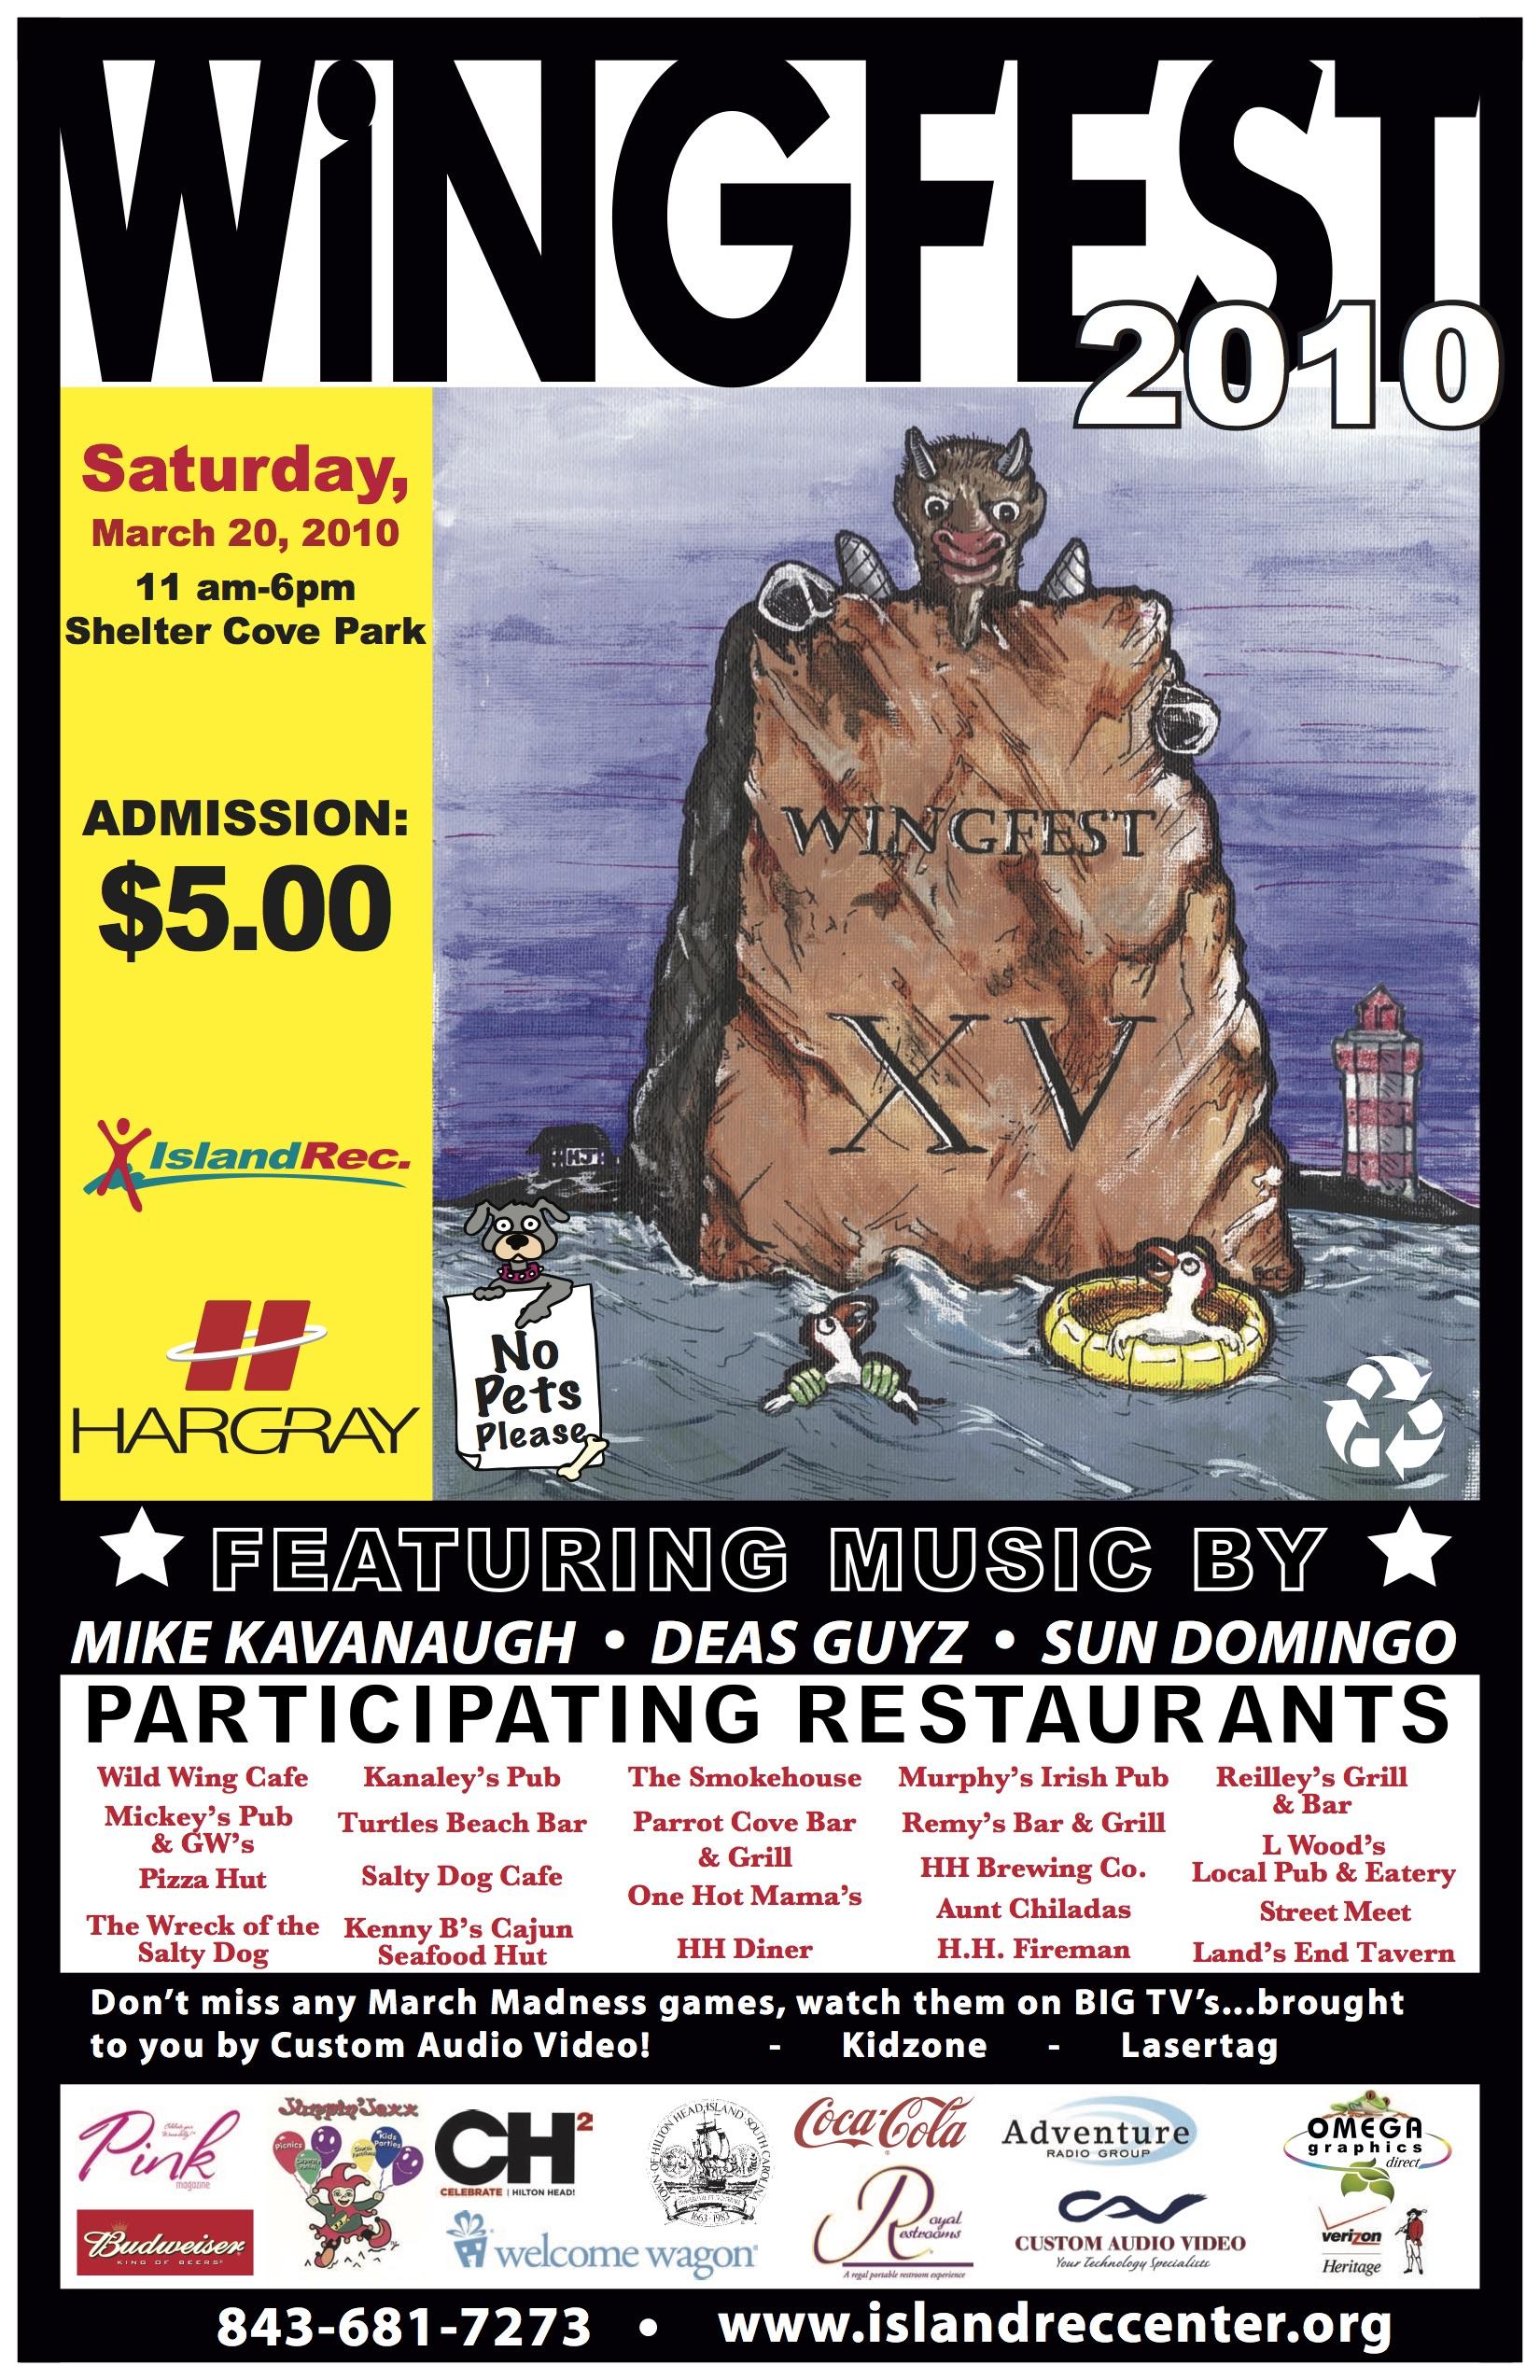 wingfest 2010 poster.jpg